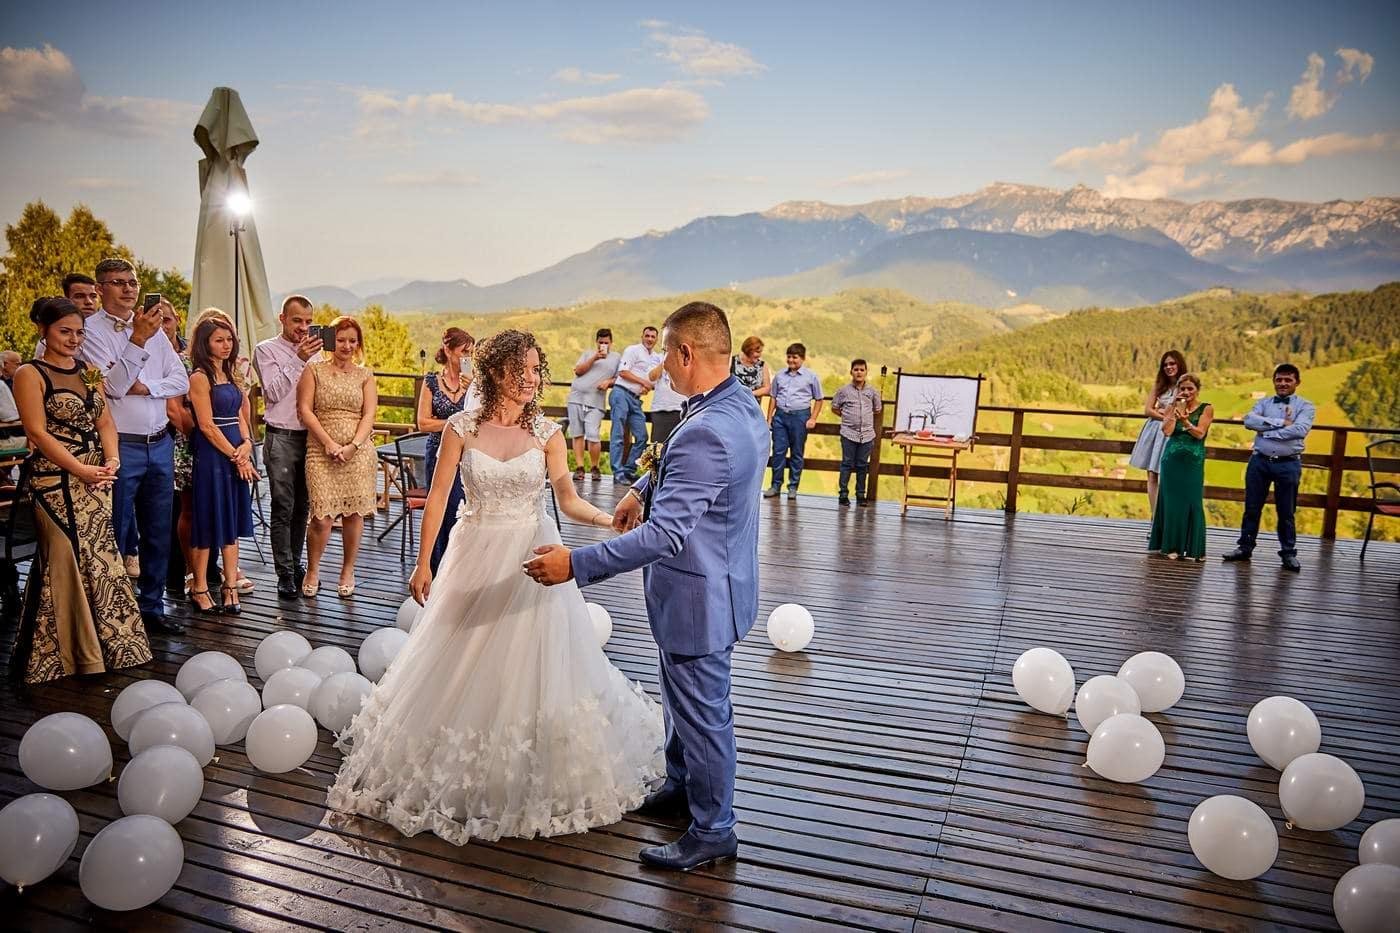 Nunta Moeciu - petrecerea nuntii